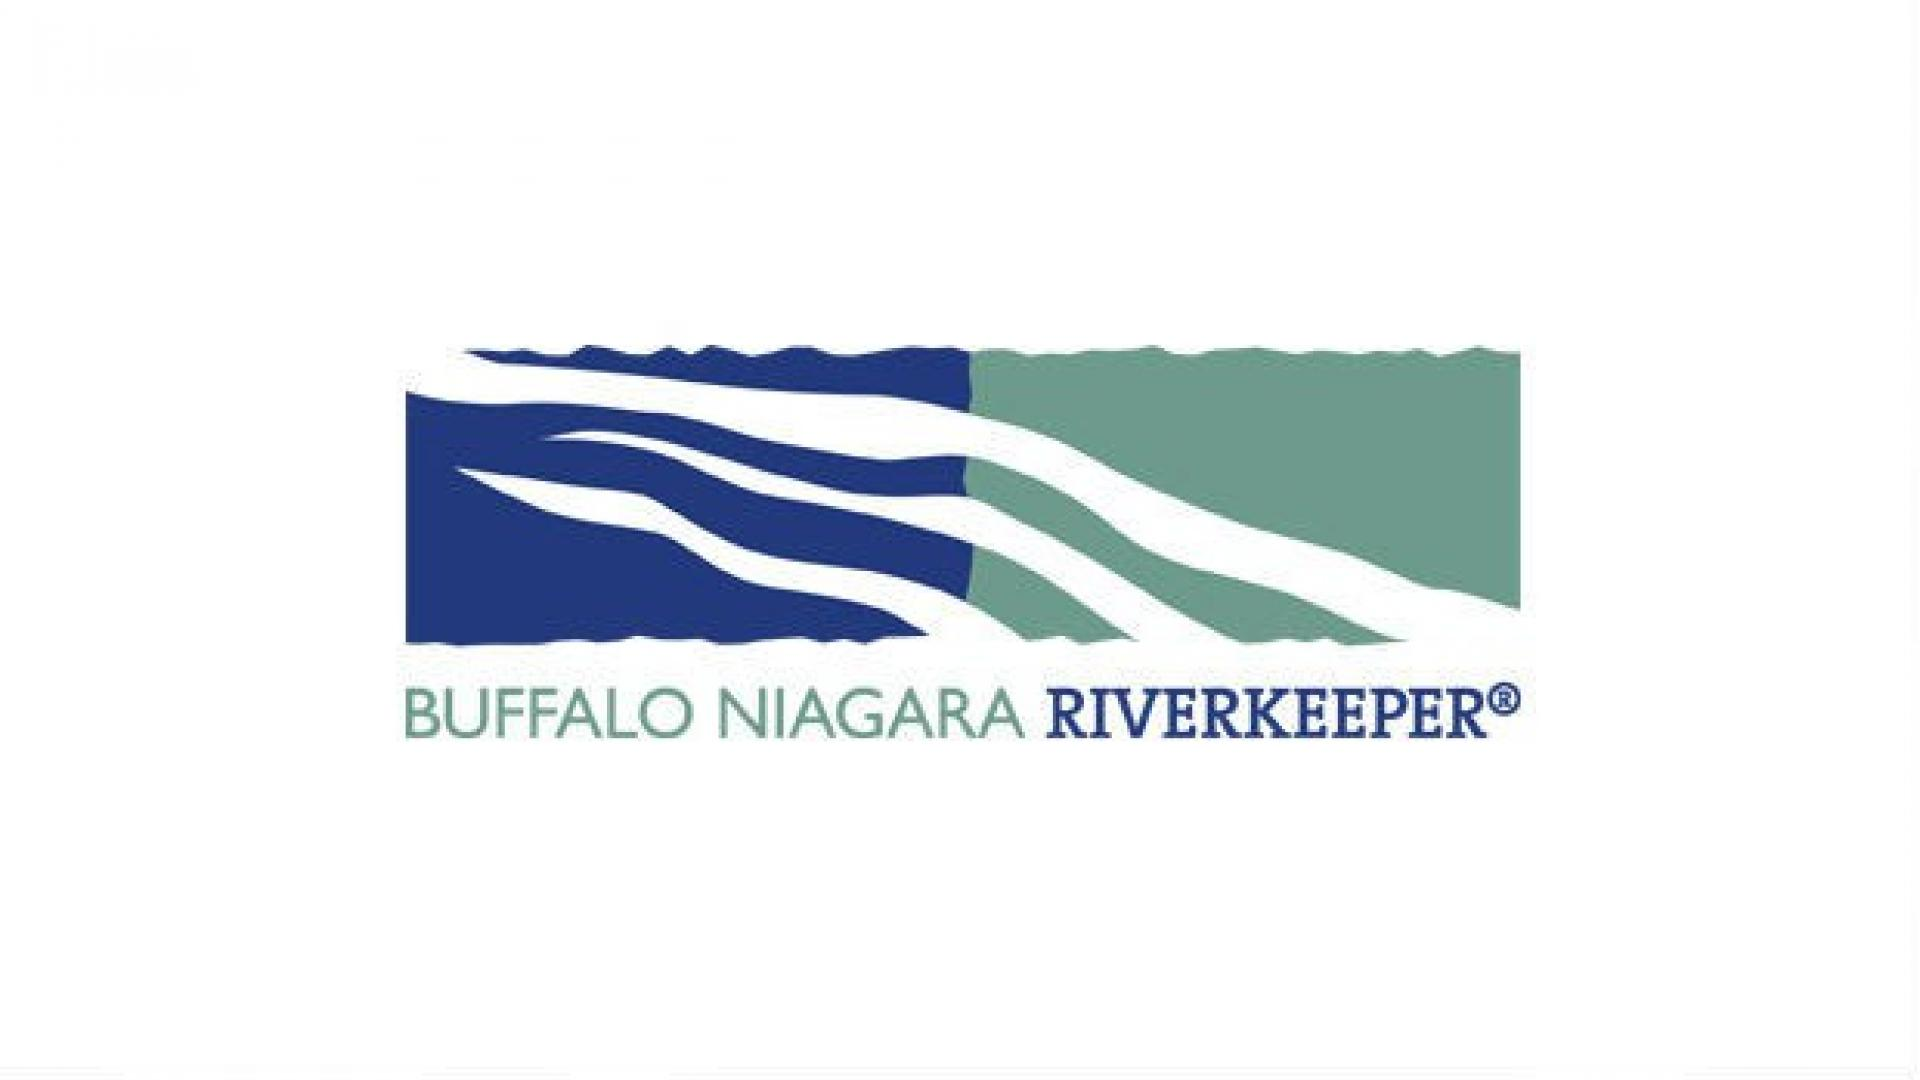 Buffalo Niagara Riverkeeper: 25 Years of Collaborating to Restore